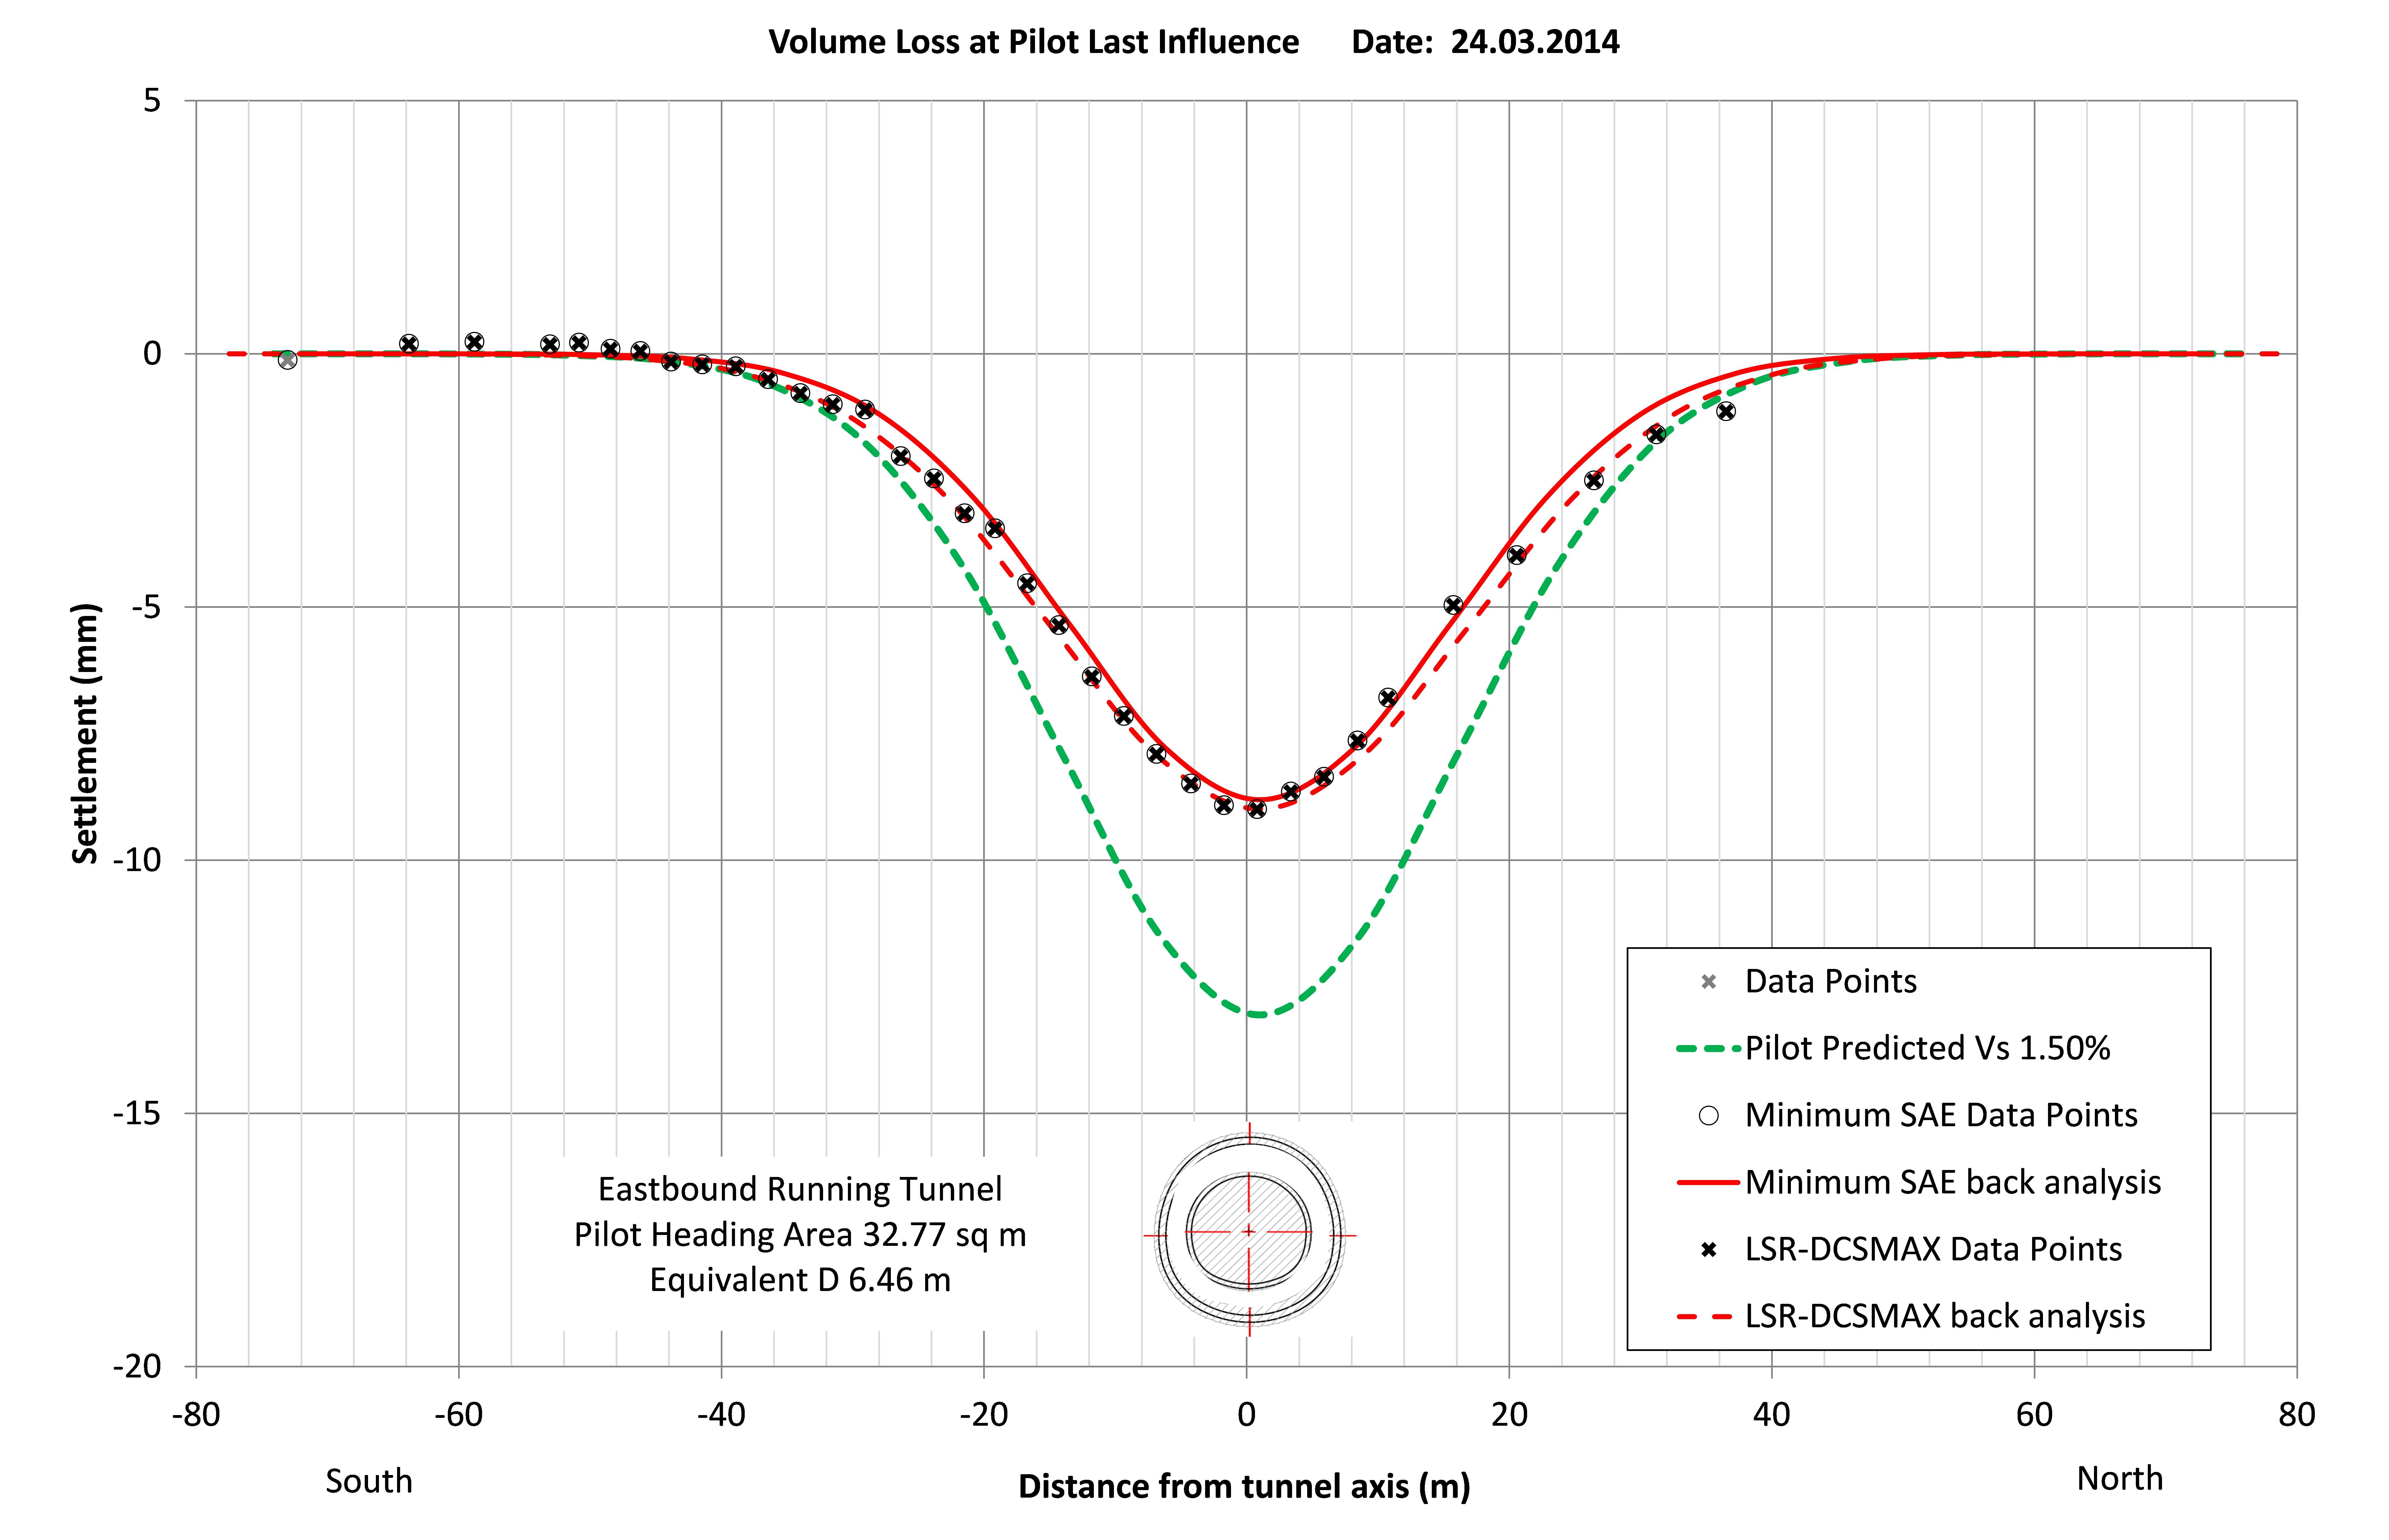 Figure 36. Short term volume loss for the EBRT-W Pilot Tunnel